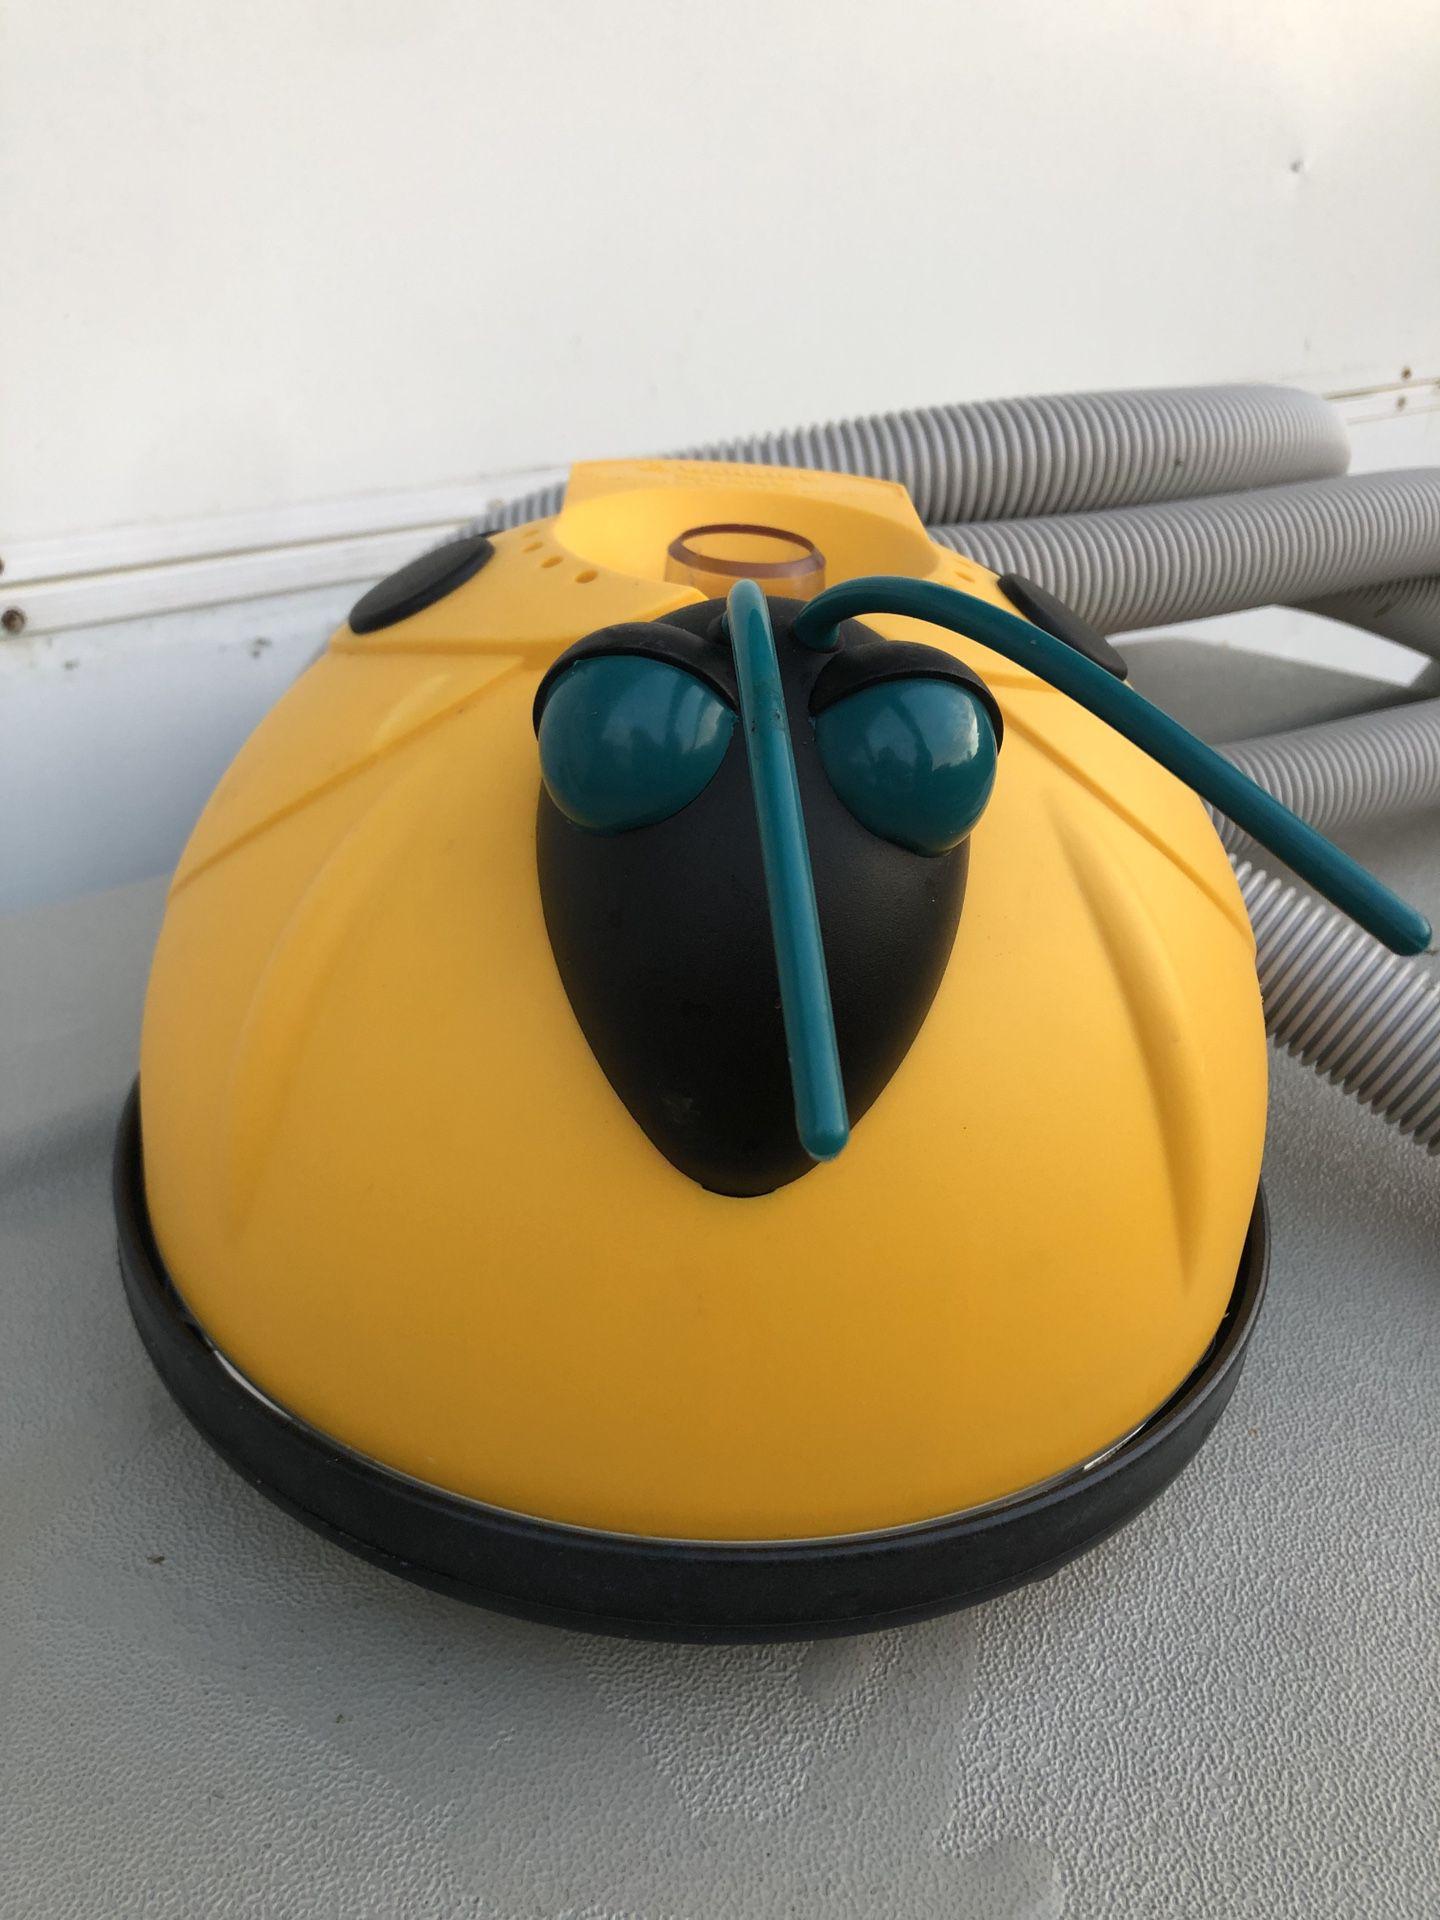 Hayward ladybug 500y vacuum